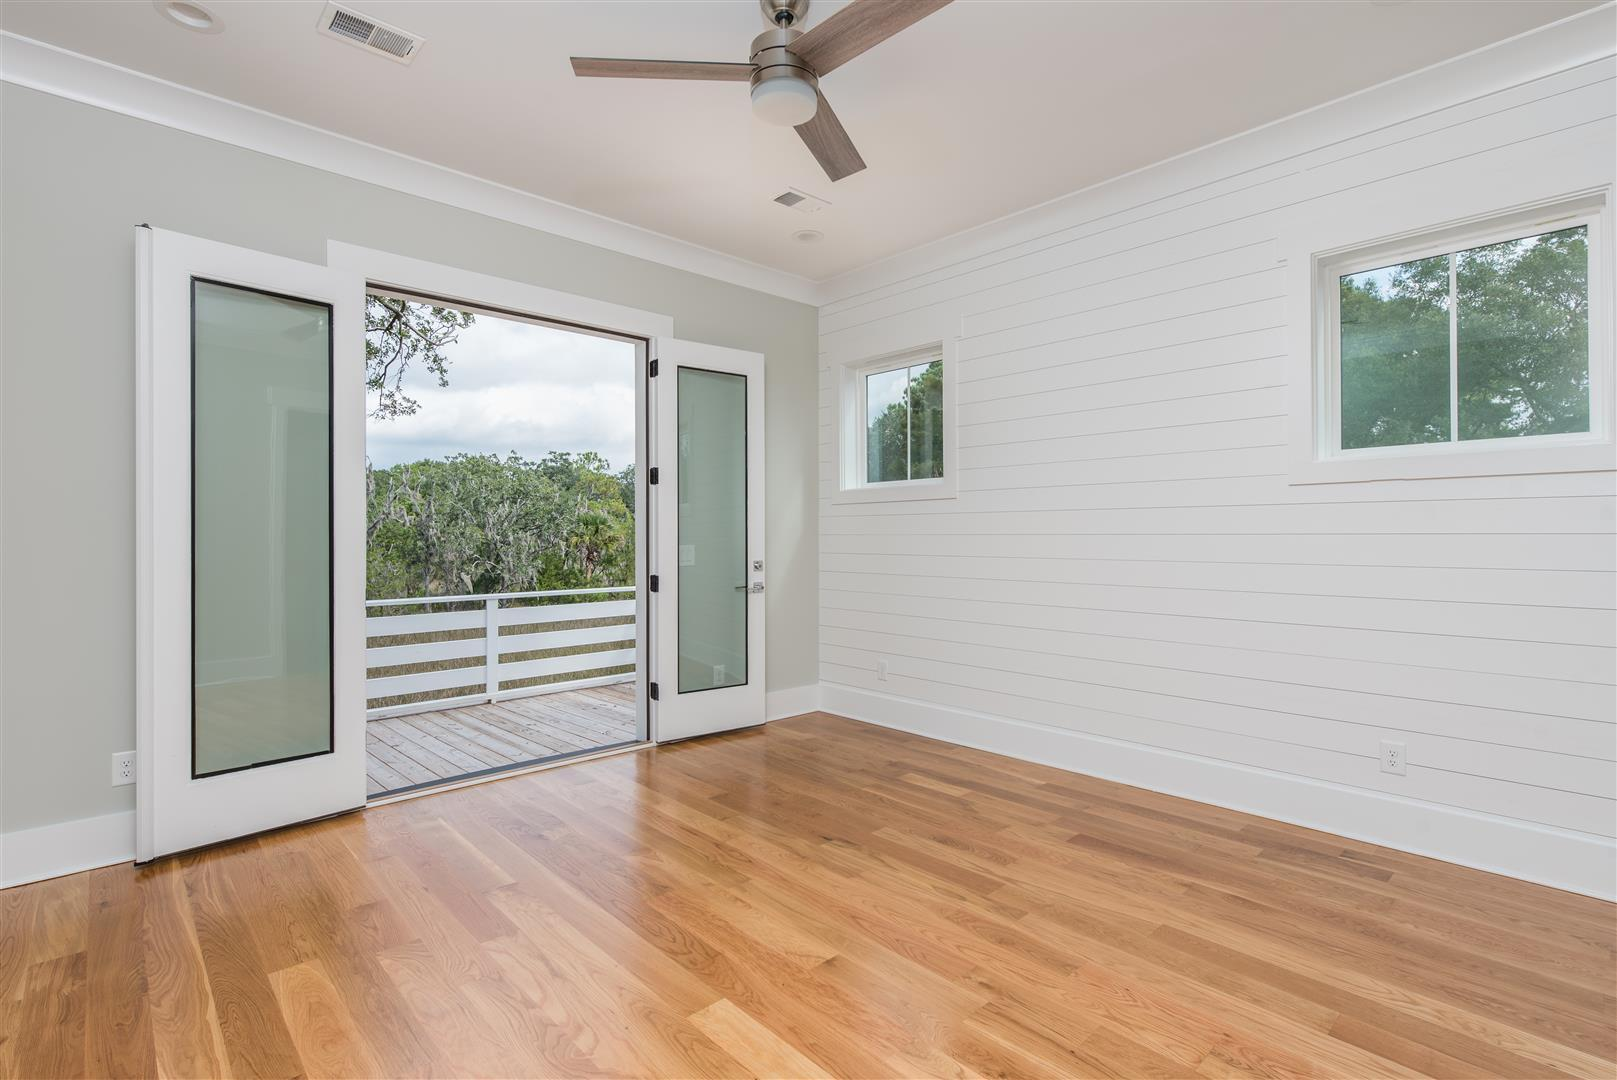 Scanlonville Homes For Sale - 160 5th, Mount Pleasant, SC - 10